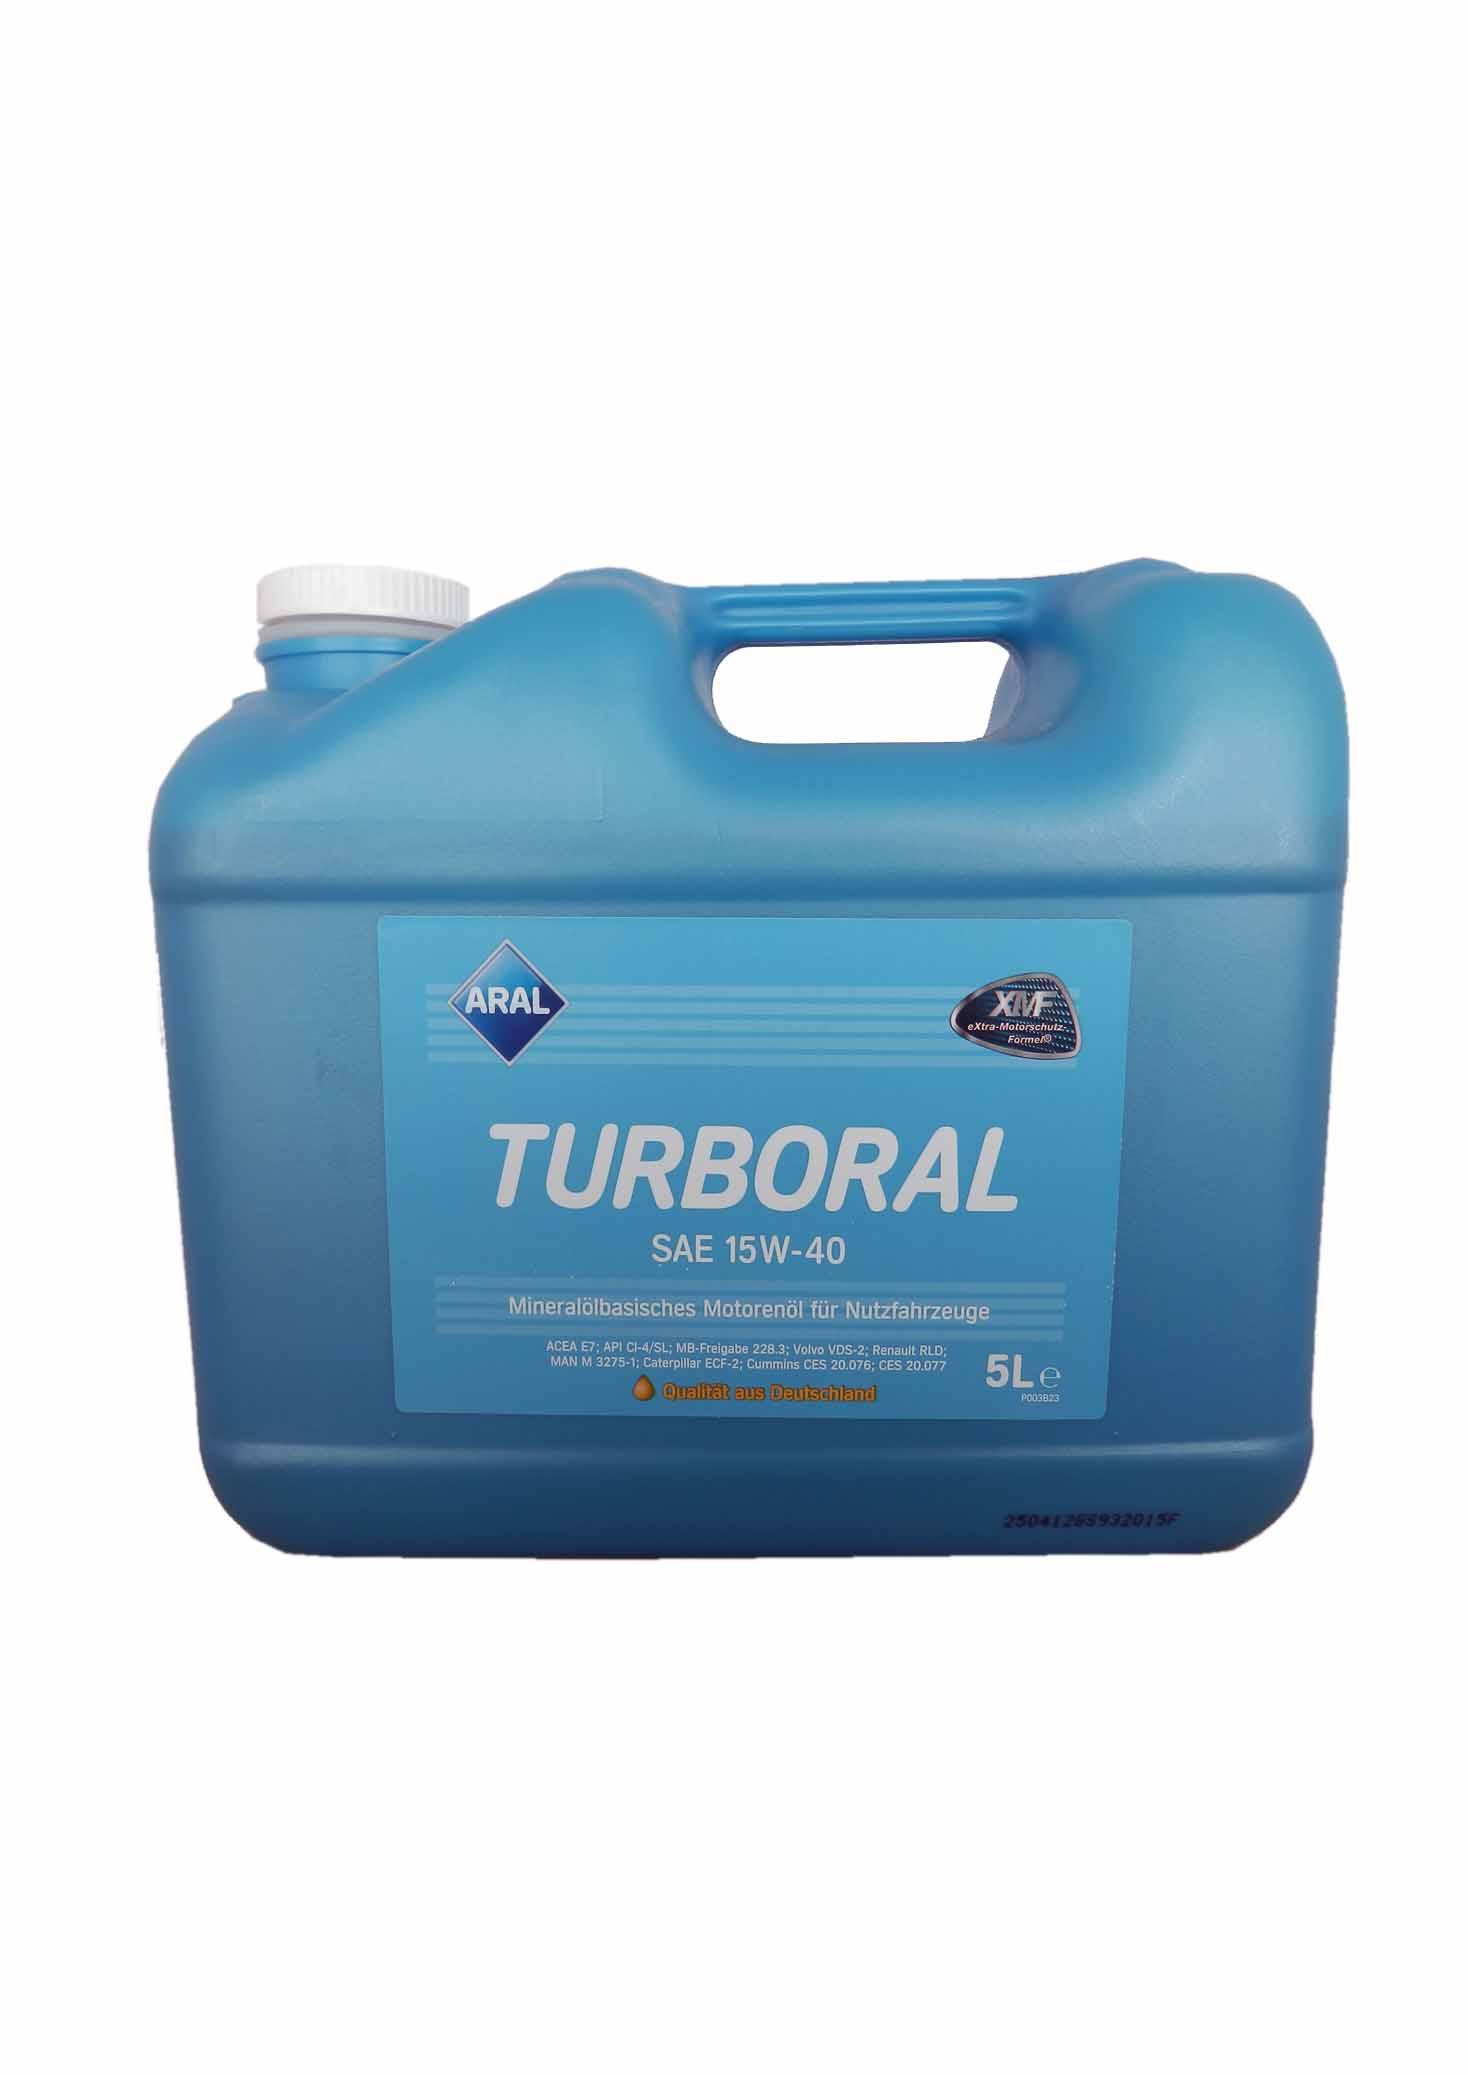 Aral Turboral SAE 15W-40